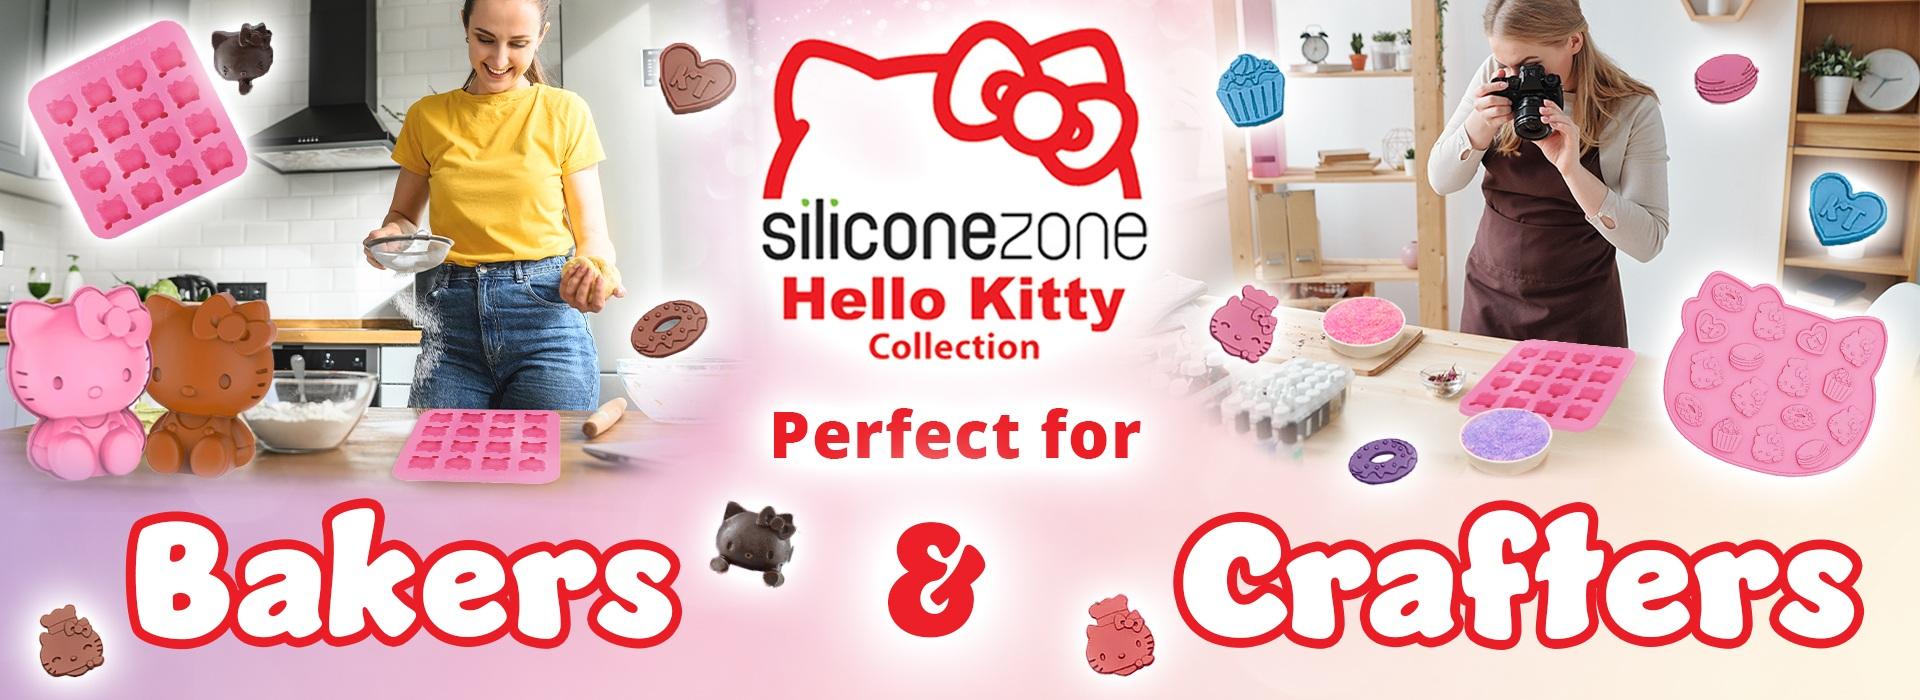 SZ-253215-HelloKitty-Website-Banners-1920x700-042721 (1)